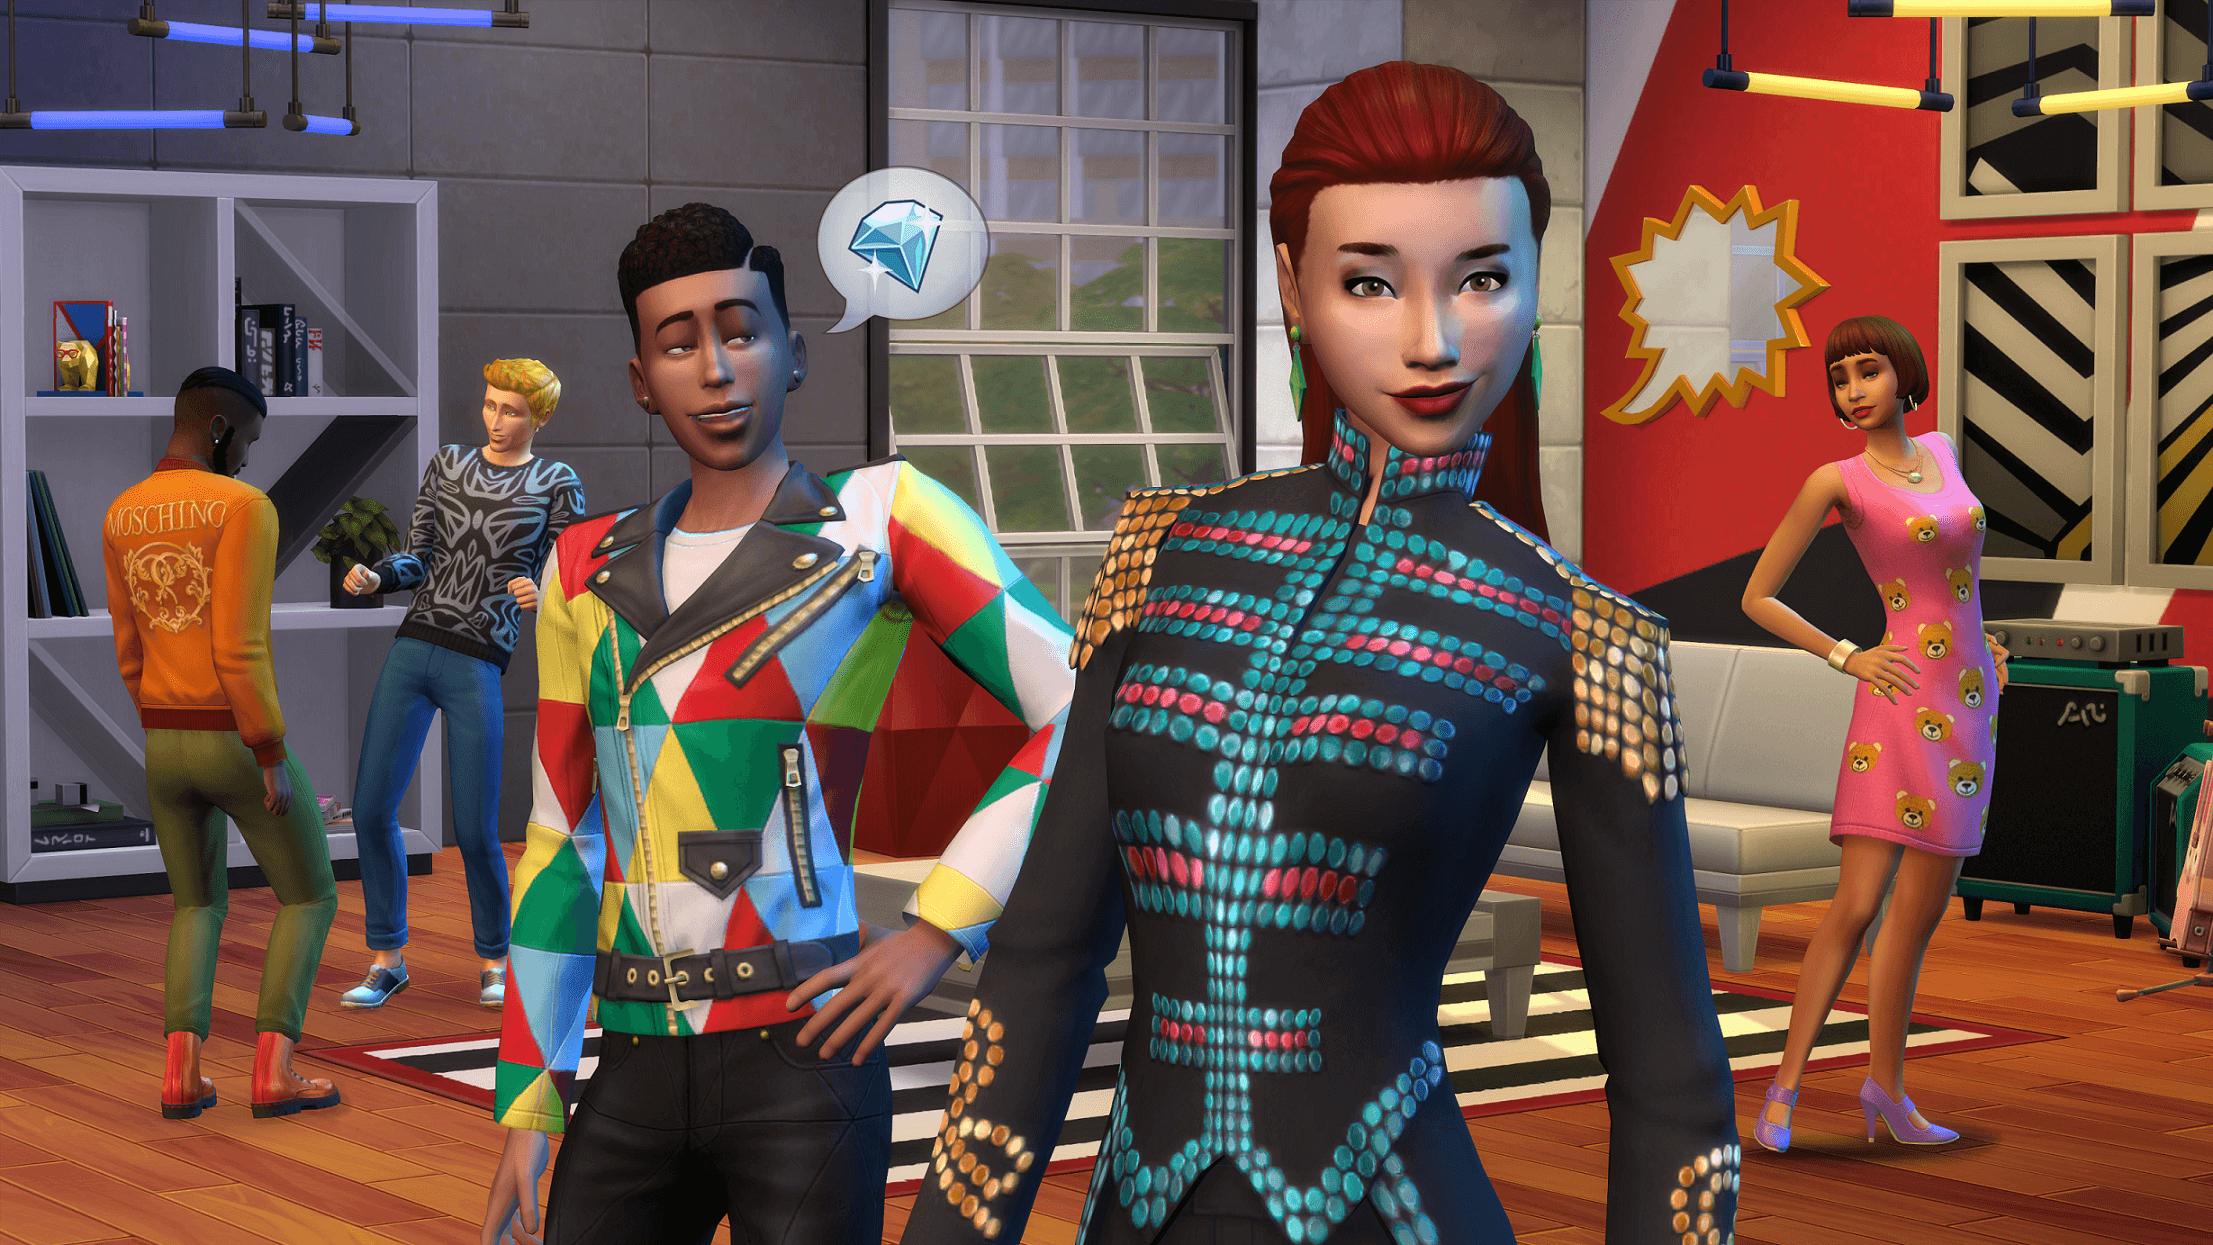 Die Sims 4 Alle Accessoires / Stuff Packs reduziert